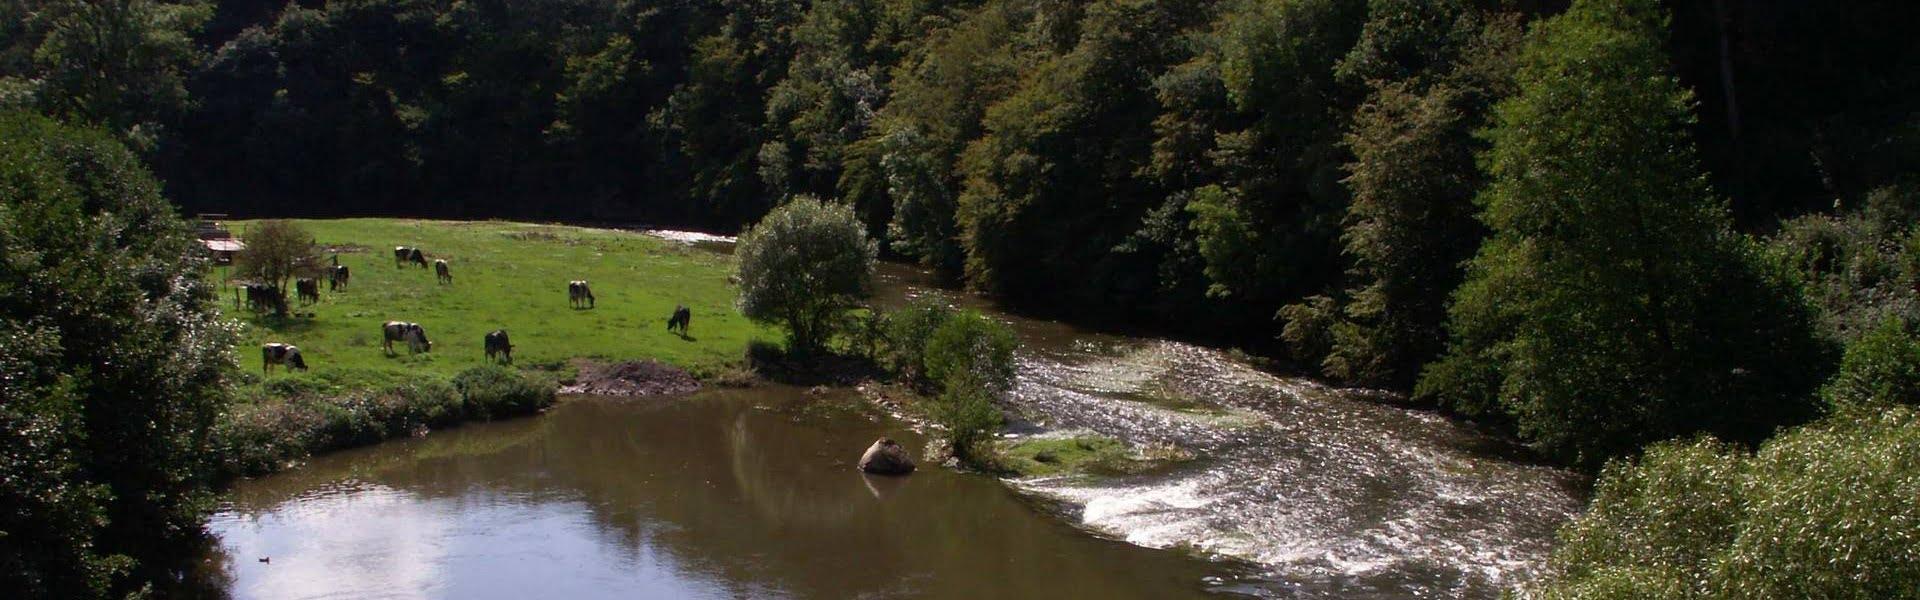 Duitsland   Wandelen in de Eifel over de Matthiasweg – Deel 2